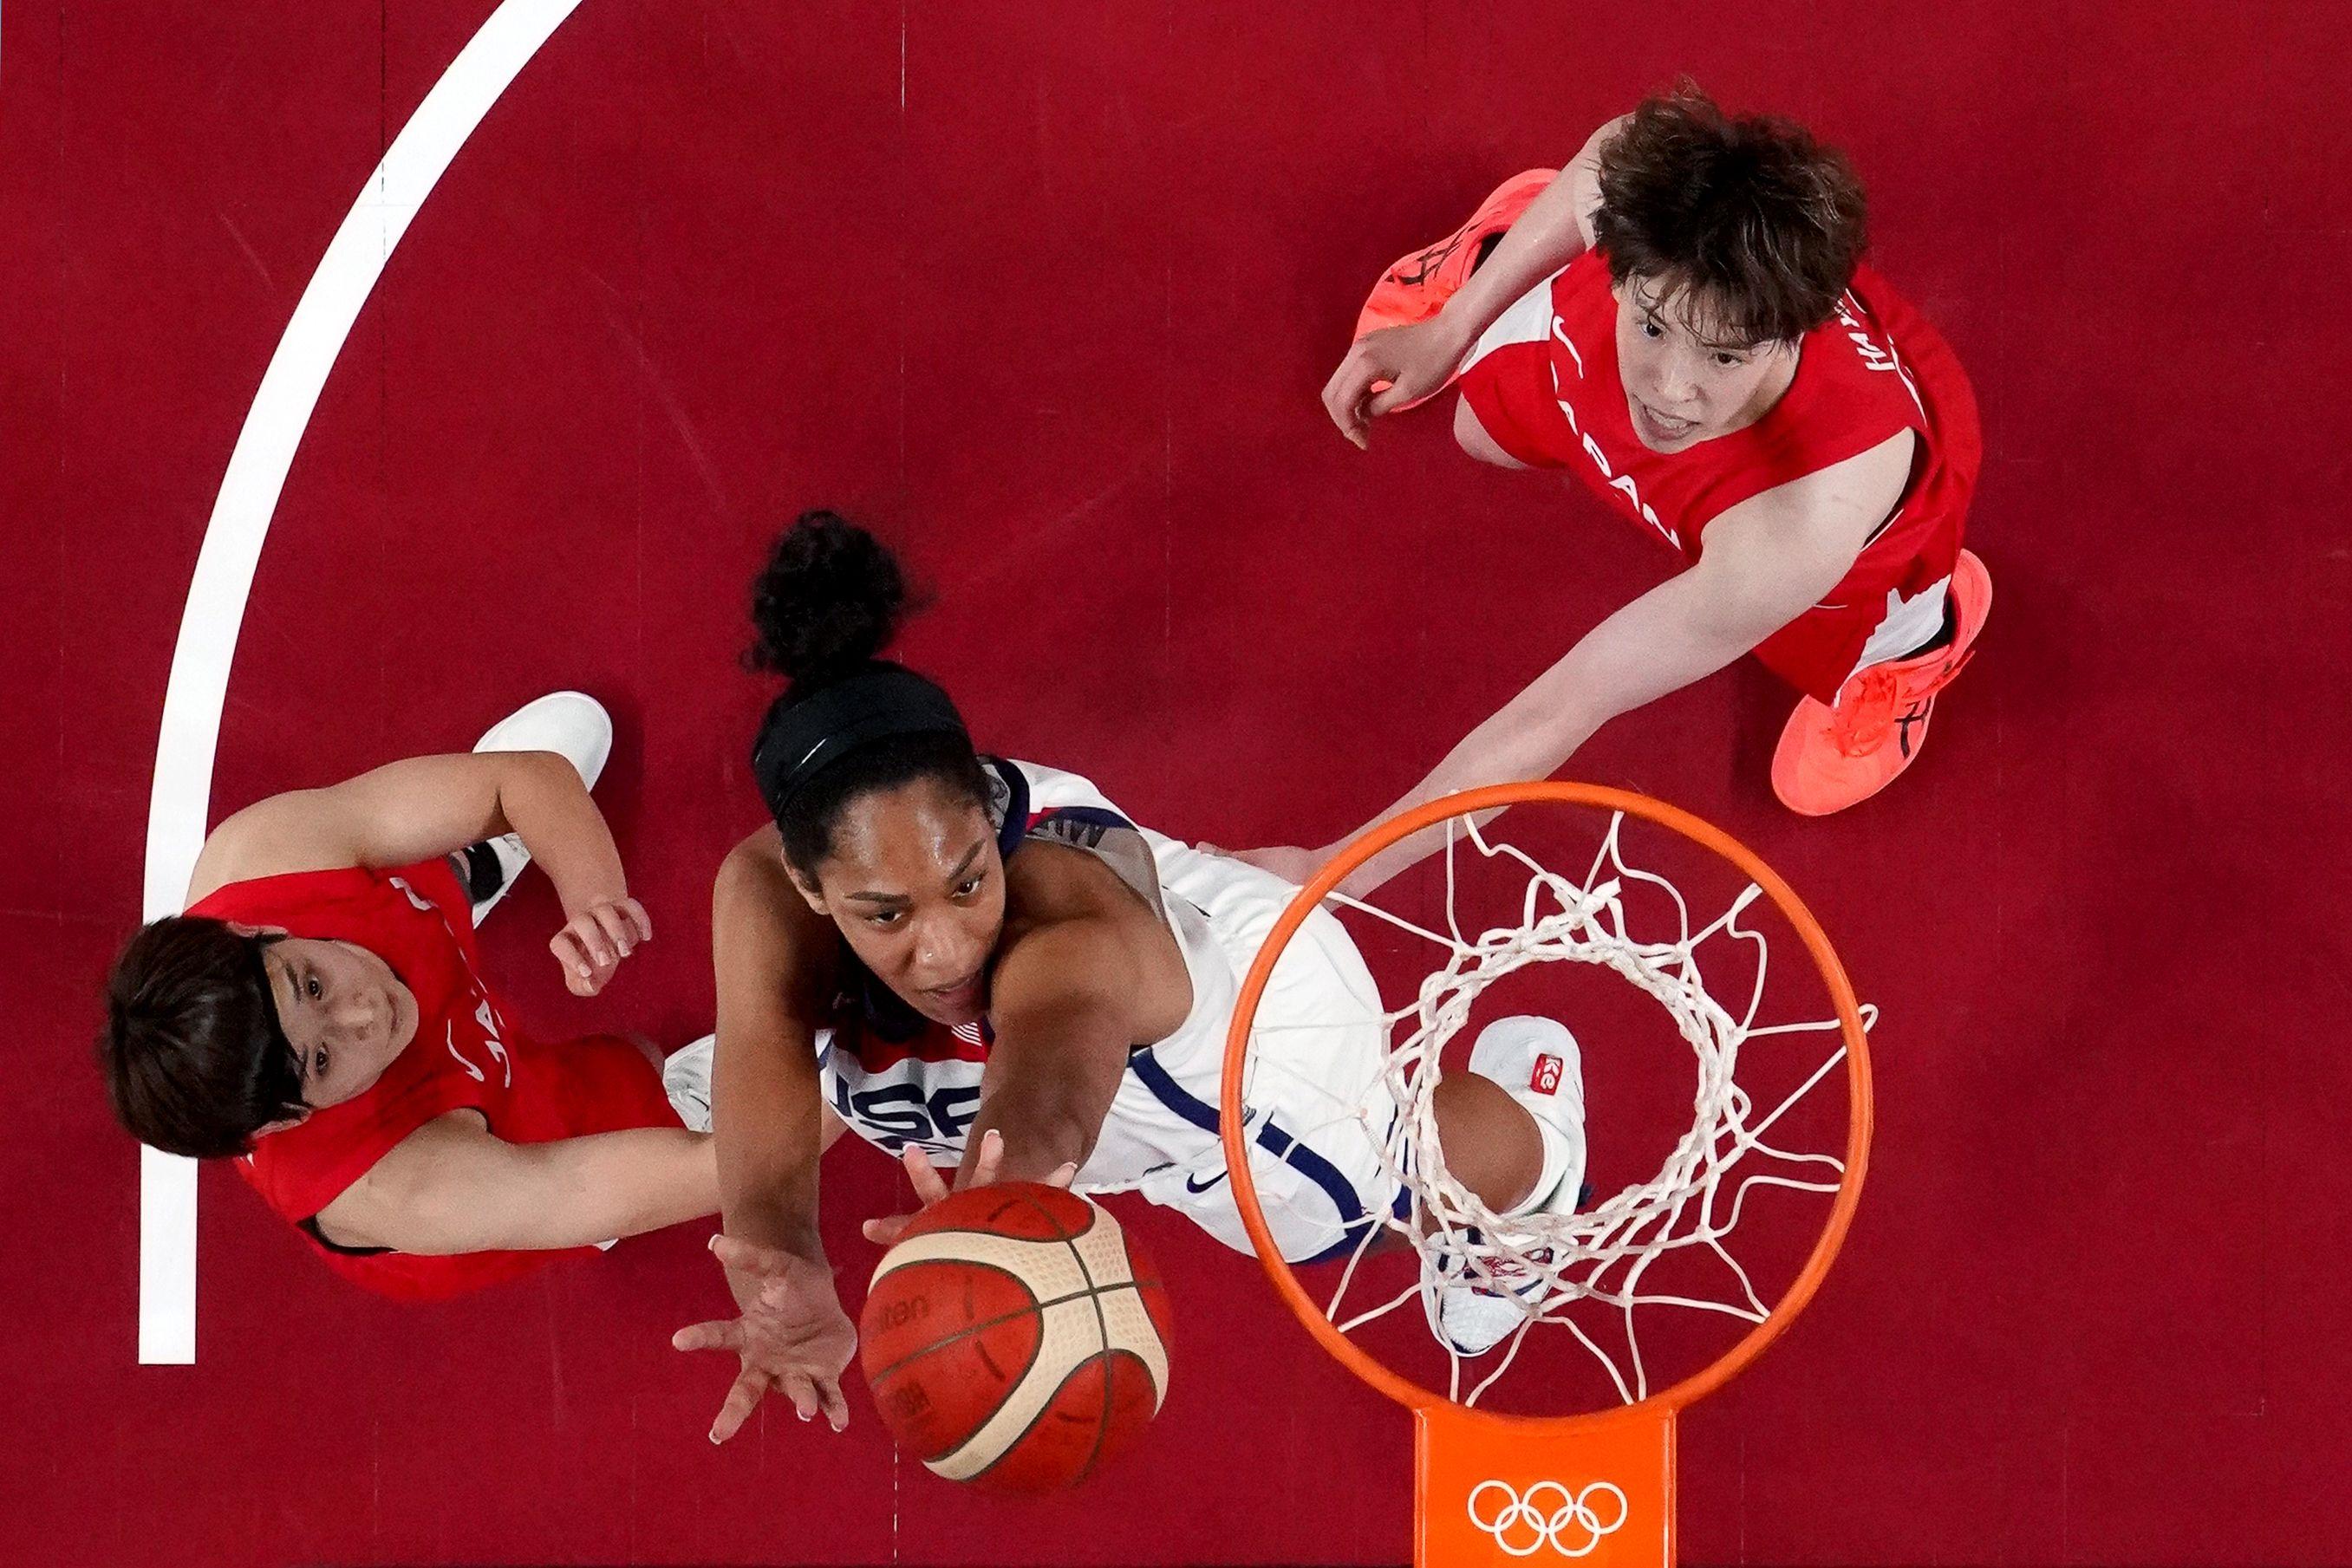 Tokyo 2020 Olympics - Basketball - Women - Group B - United States v Japan - Saitama Super Arena, Saitama, Japan - July 30, 2021. Saki Hayashi of Japan ans Rui Machida of Japan in action with A'Ja Wilson of the United States REUTERS/Brian Snyder